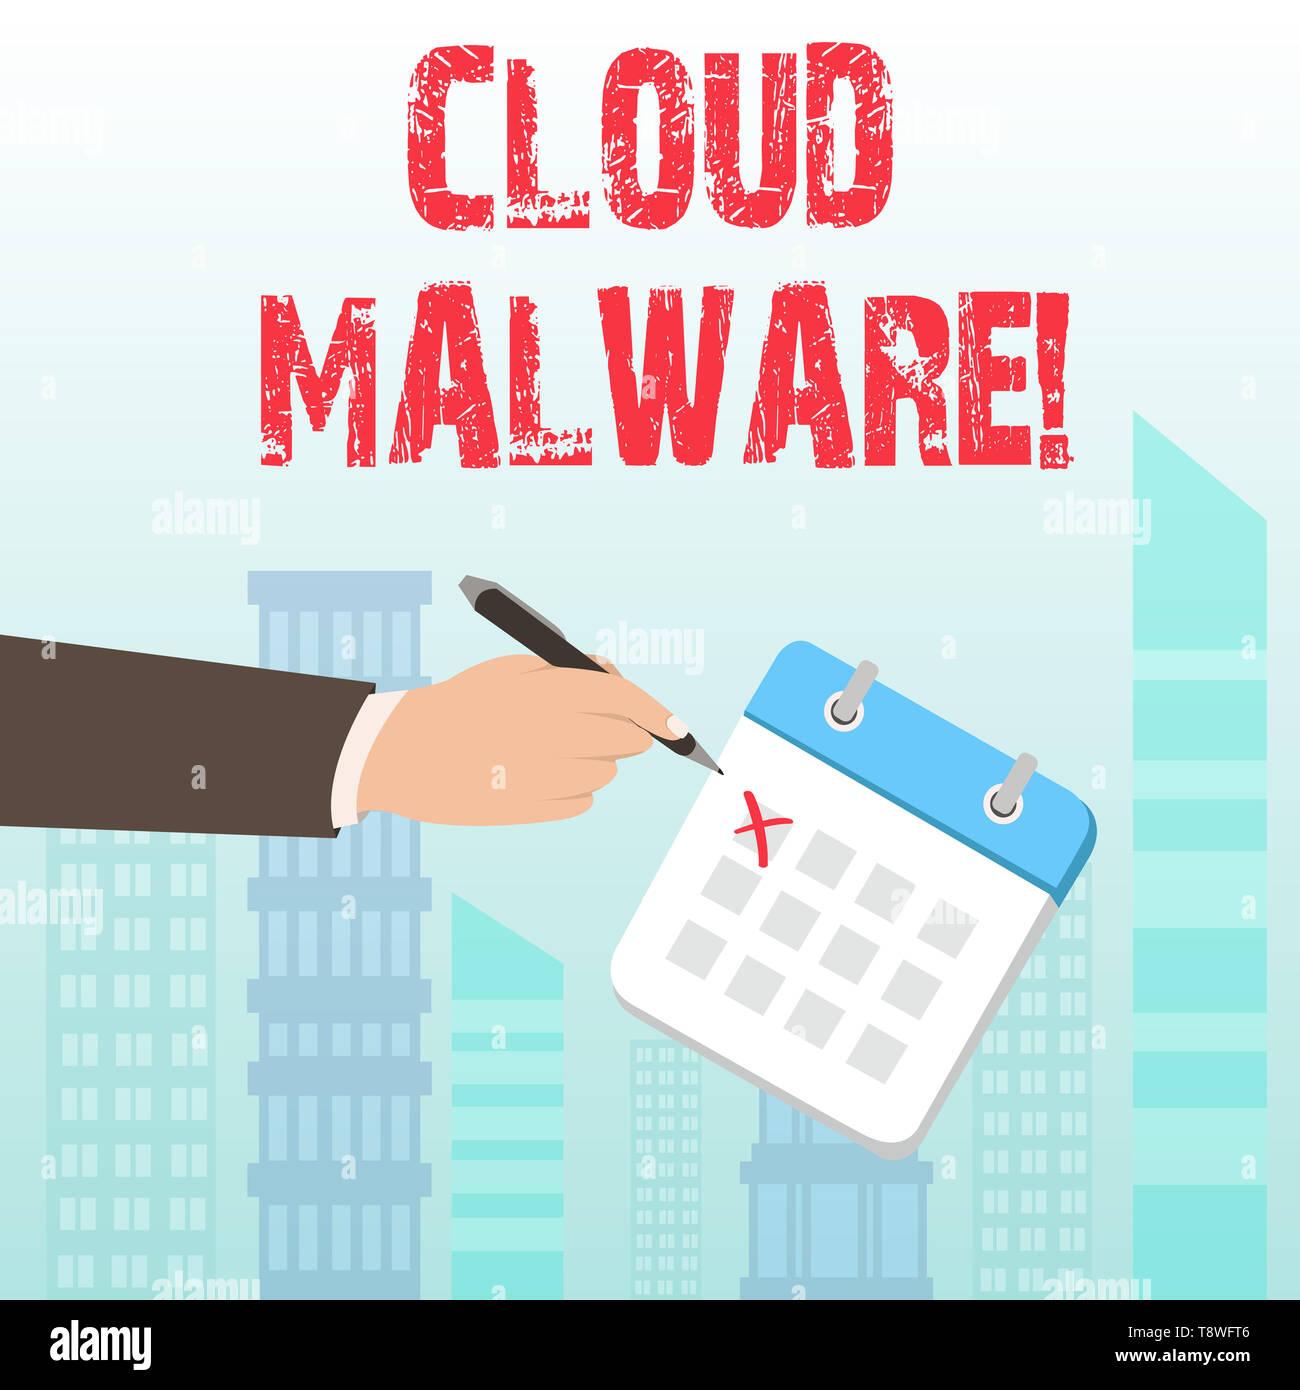 Threat Word Cloud Stock Photos & Threat Word Cloud Stock